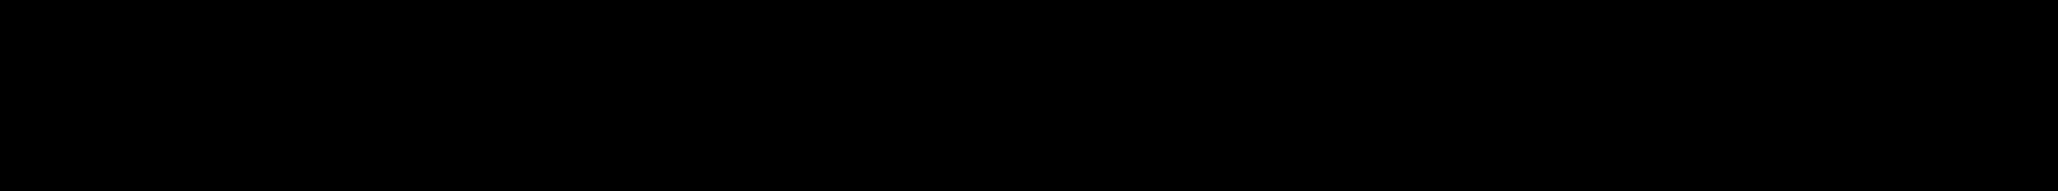 Design System B 900R